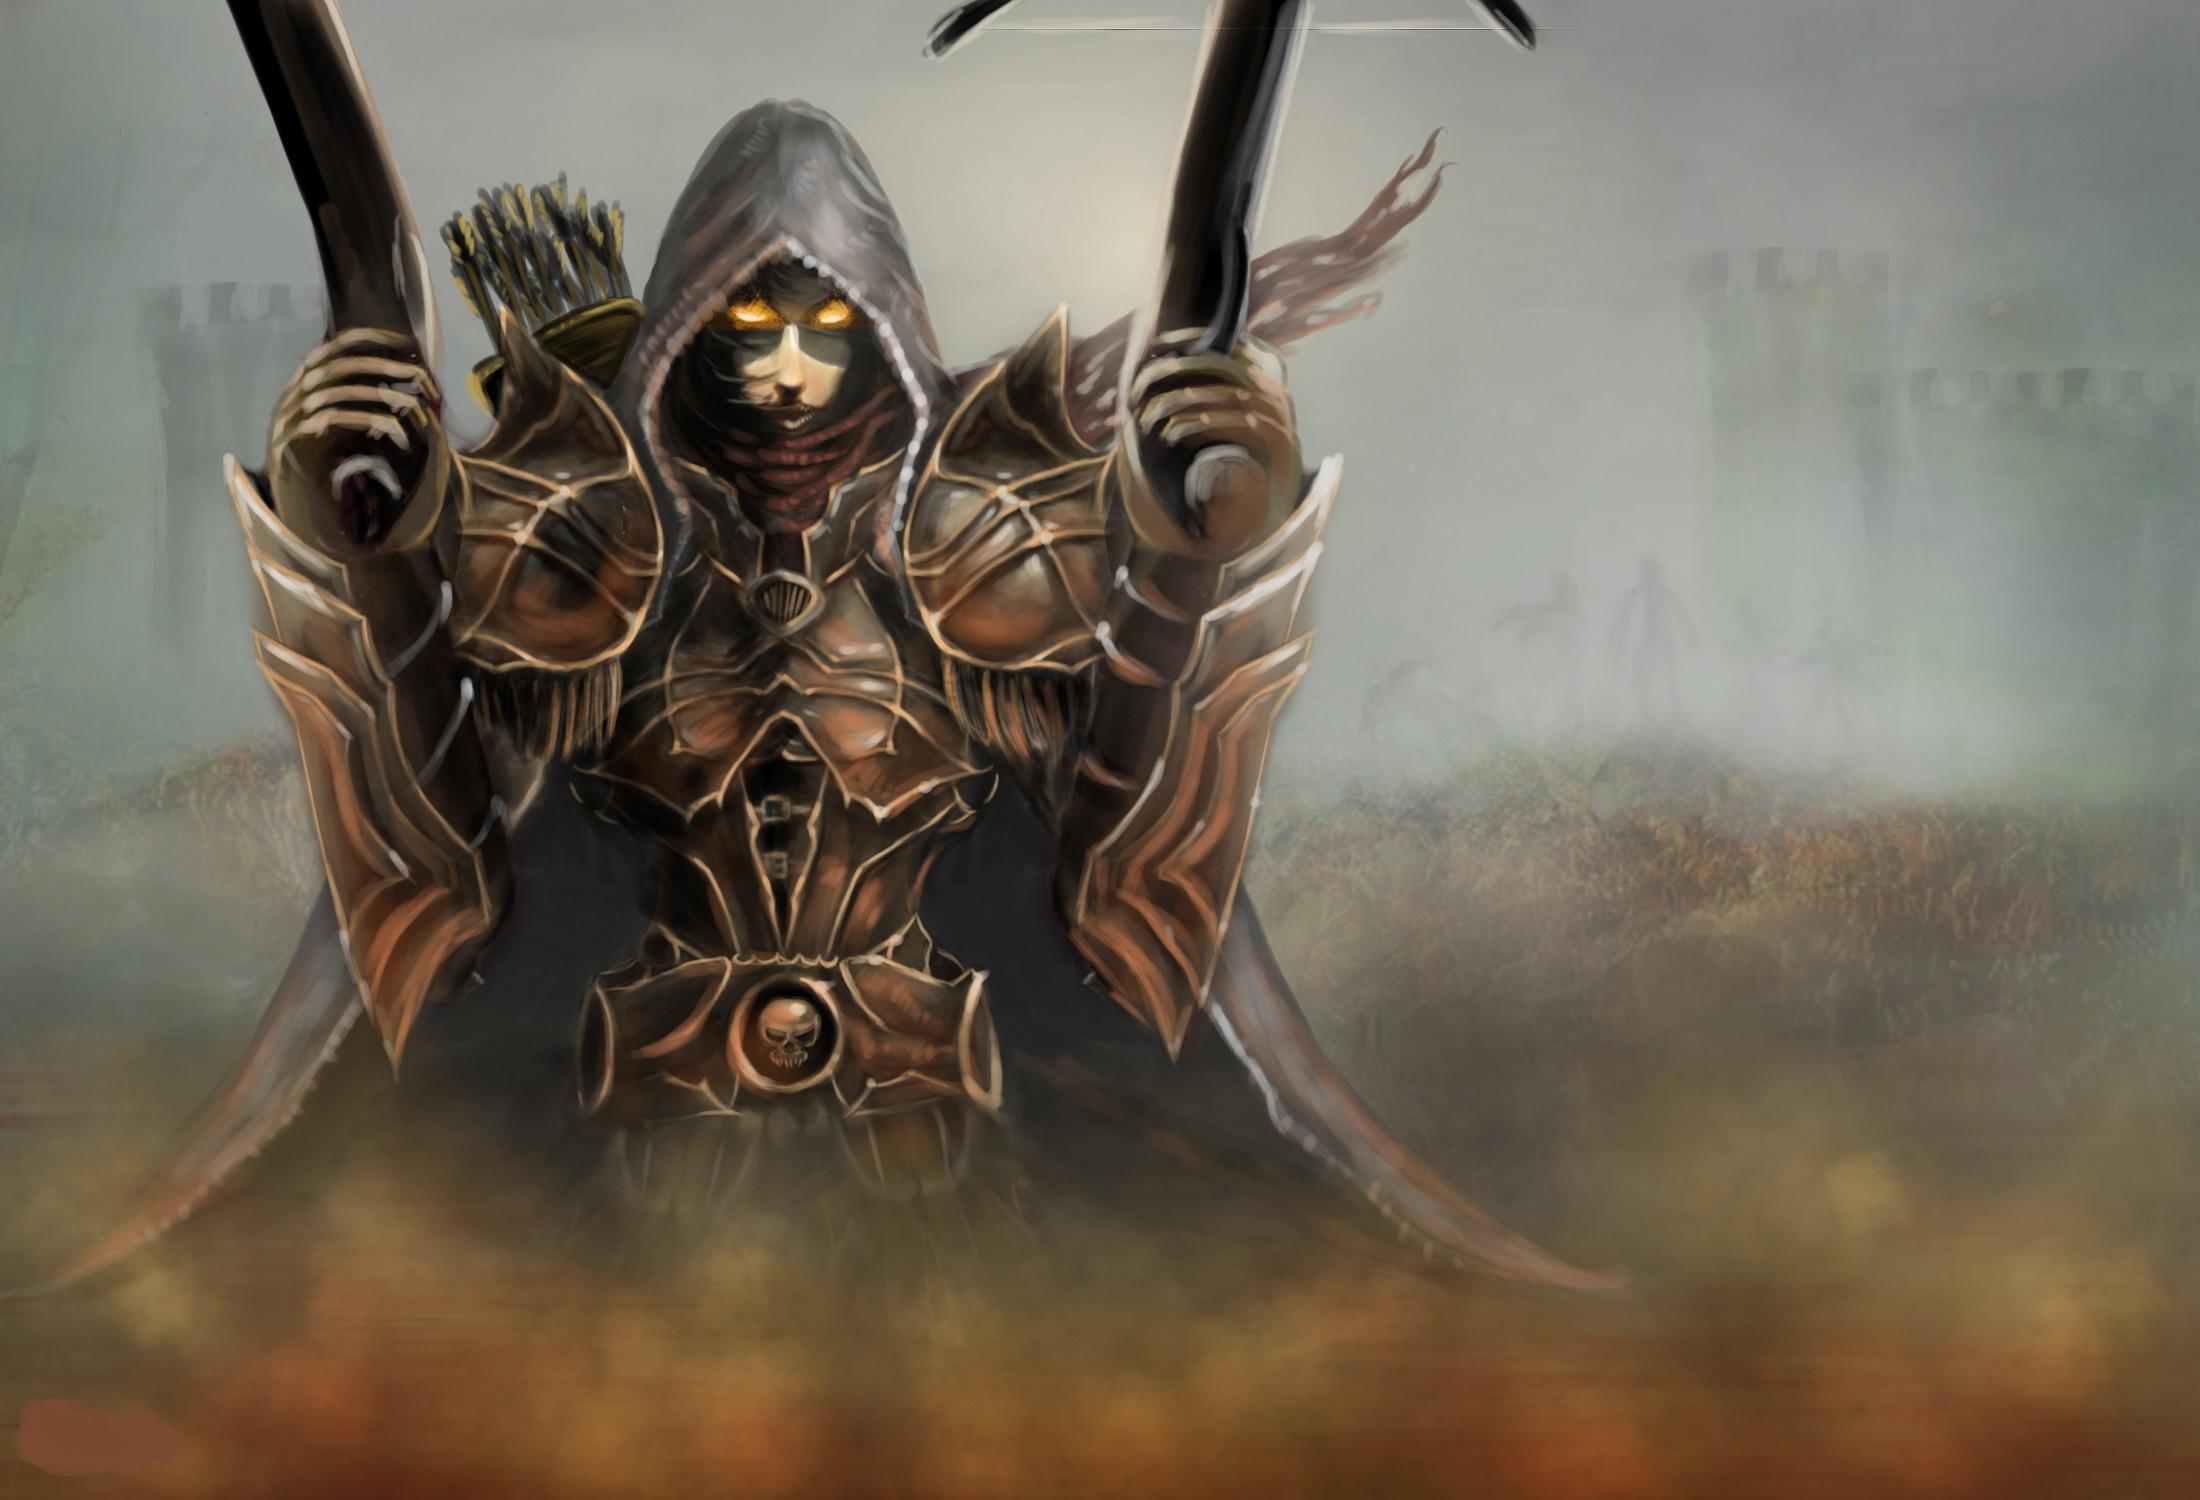 Photos Diablo 3 Armor Demon Demon Hunter Fantasy Games 2200x1500